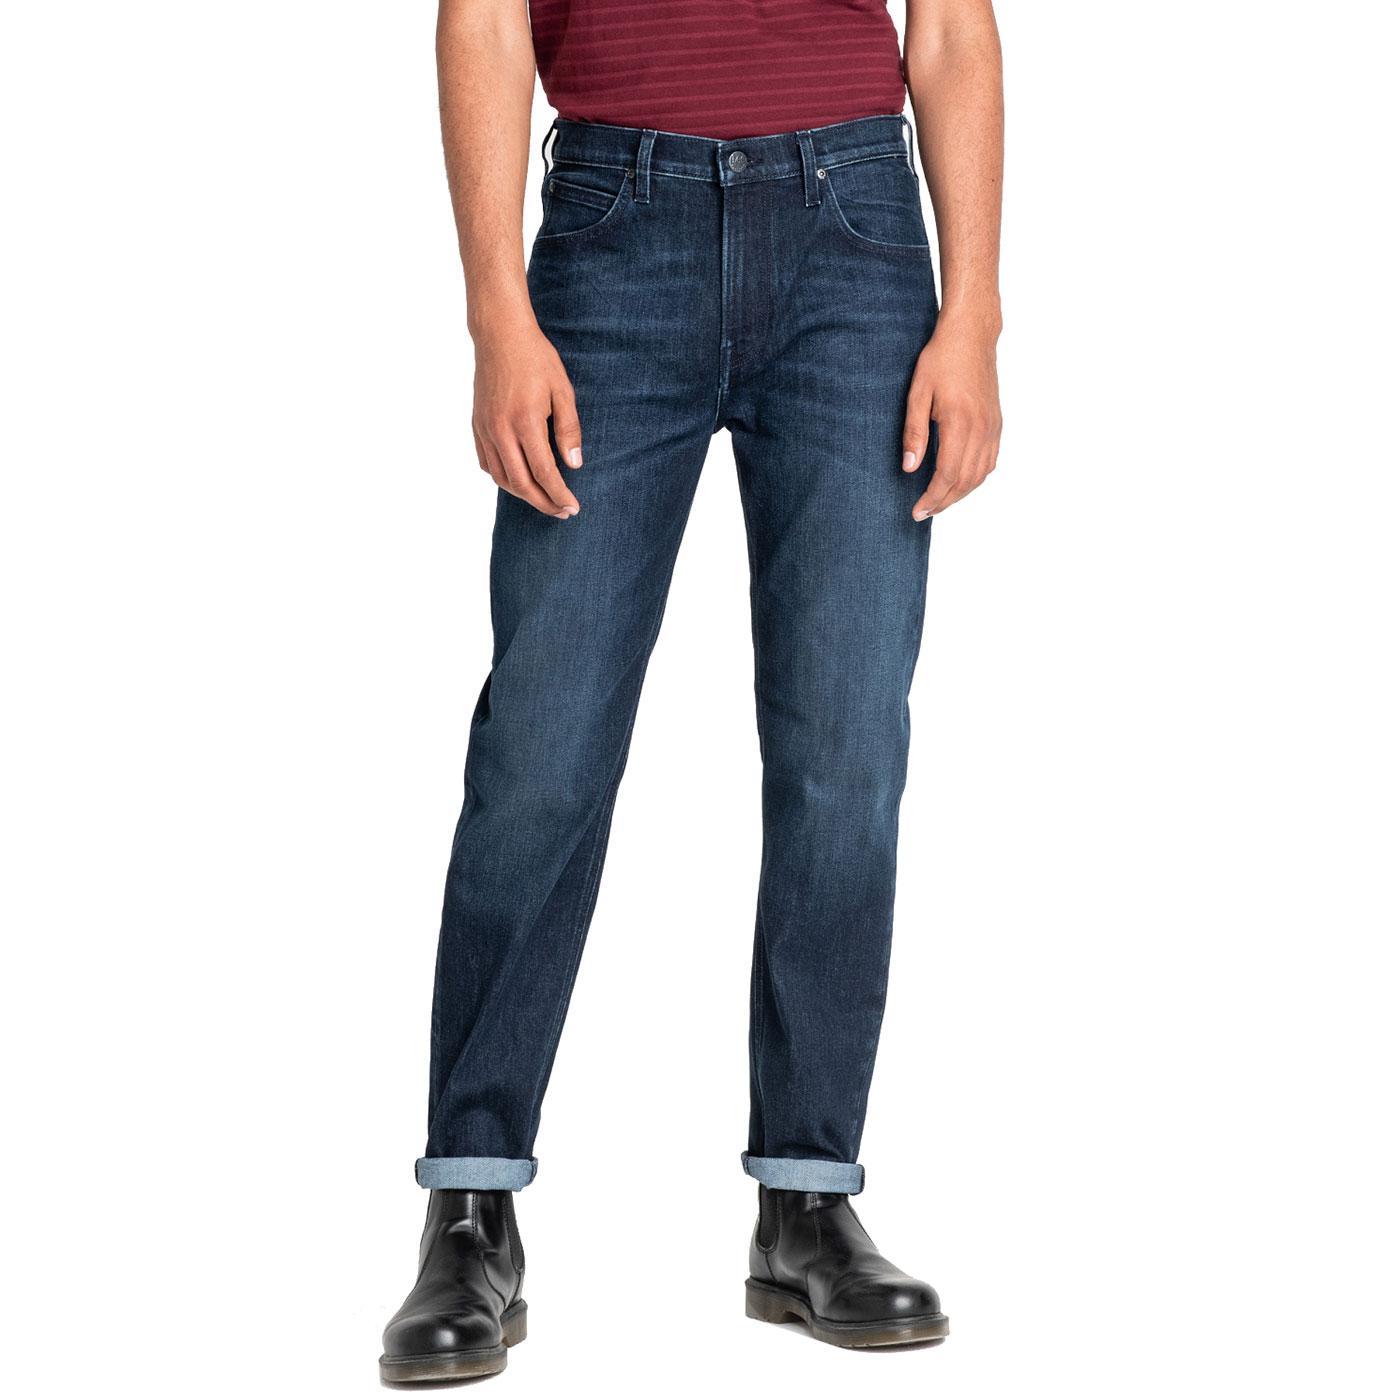 Austin LEE JEANS Tapered Denim Jeans - Dark Silver